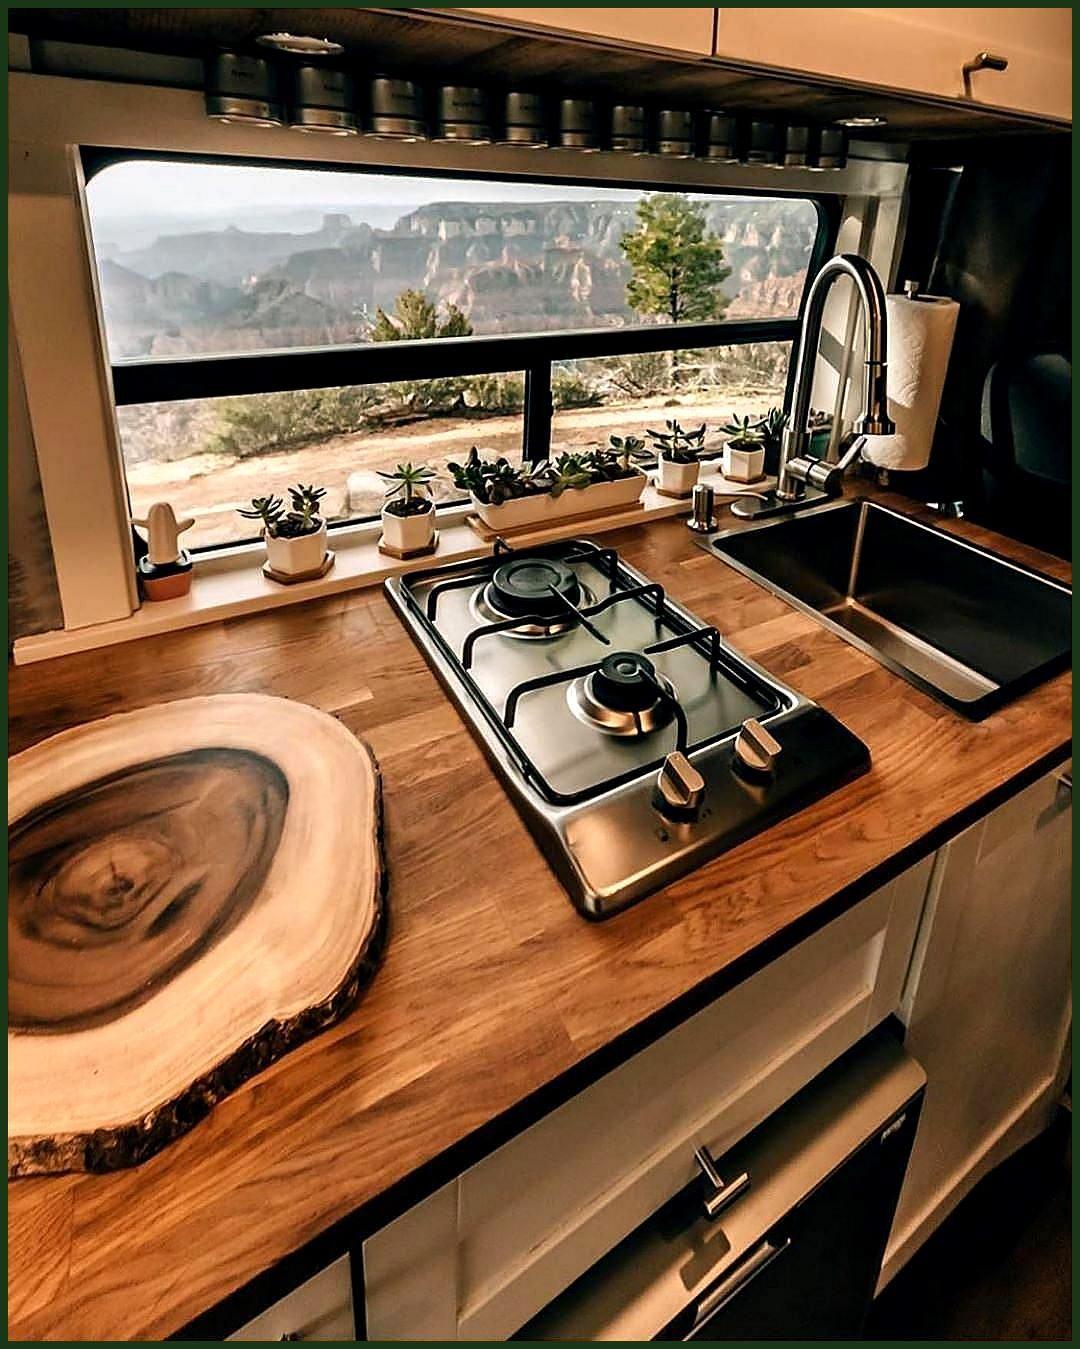 Van Conversion Company On Instagram Everything The Kitchen Sink And They Travel Vanconversion Advanture Vanlif Va Van Conversion Interior Van Life Diy Van Home